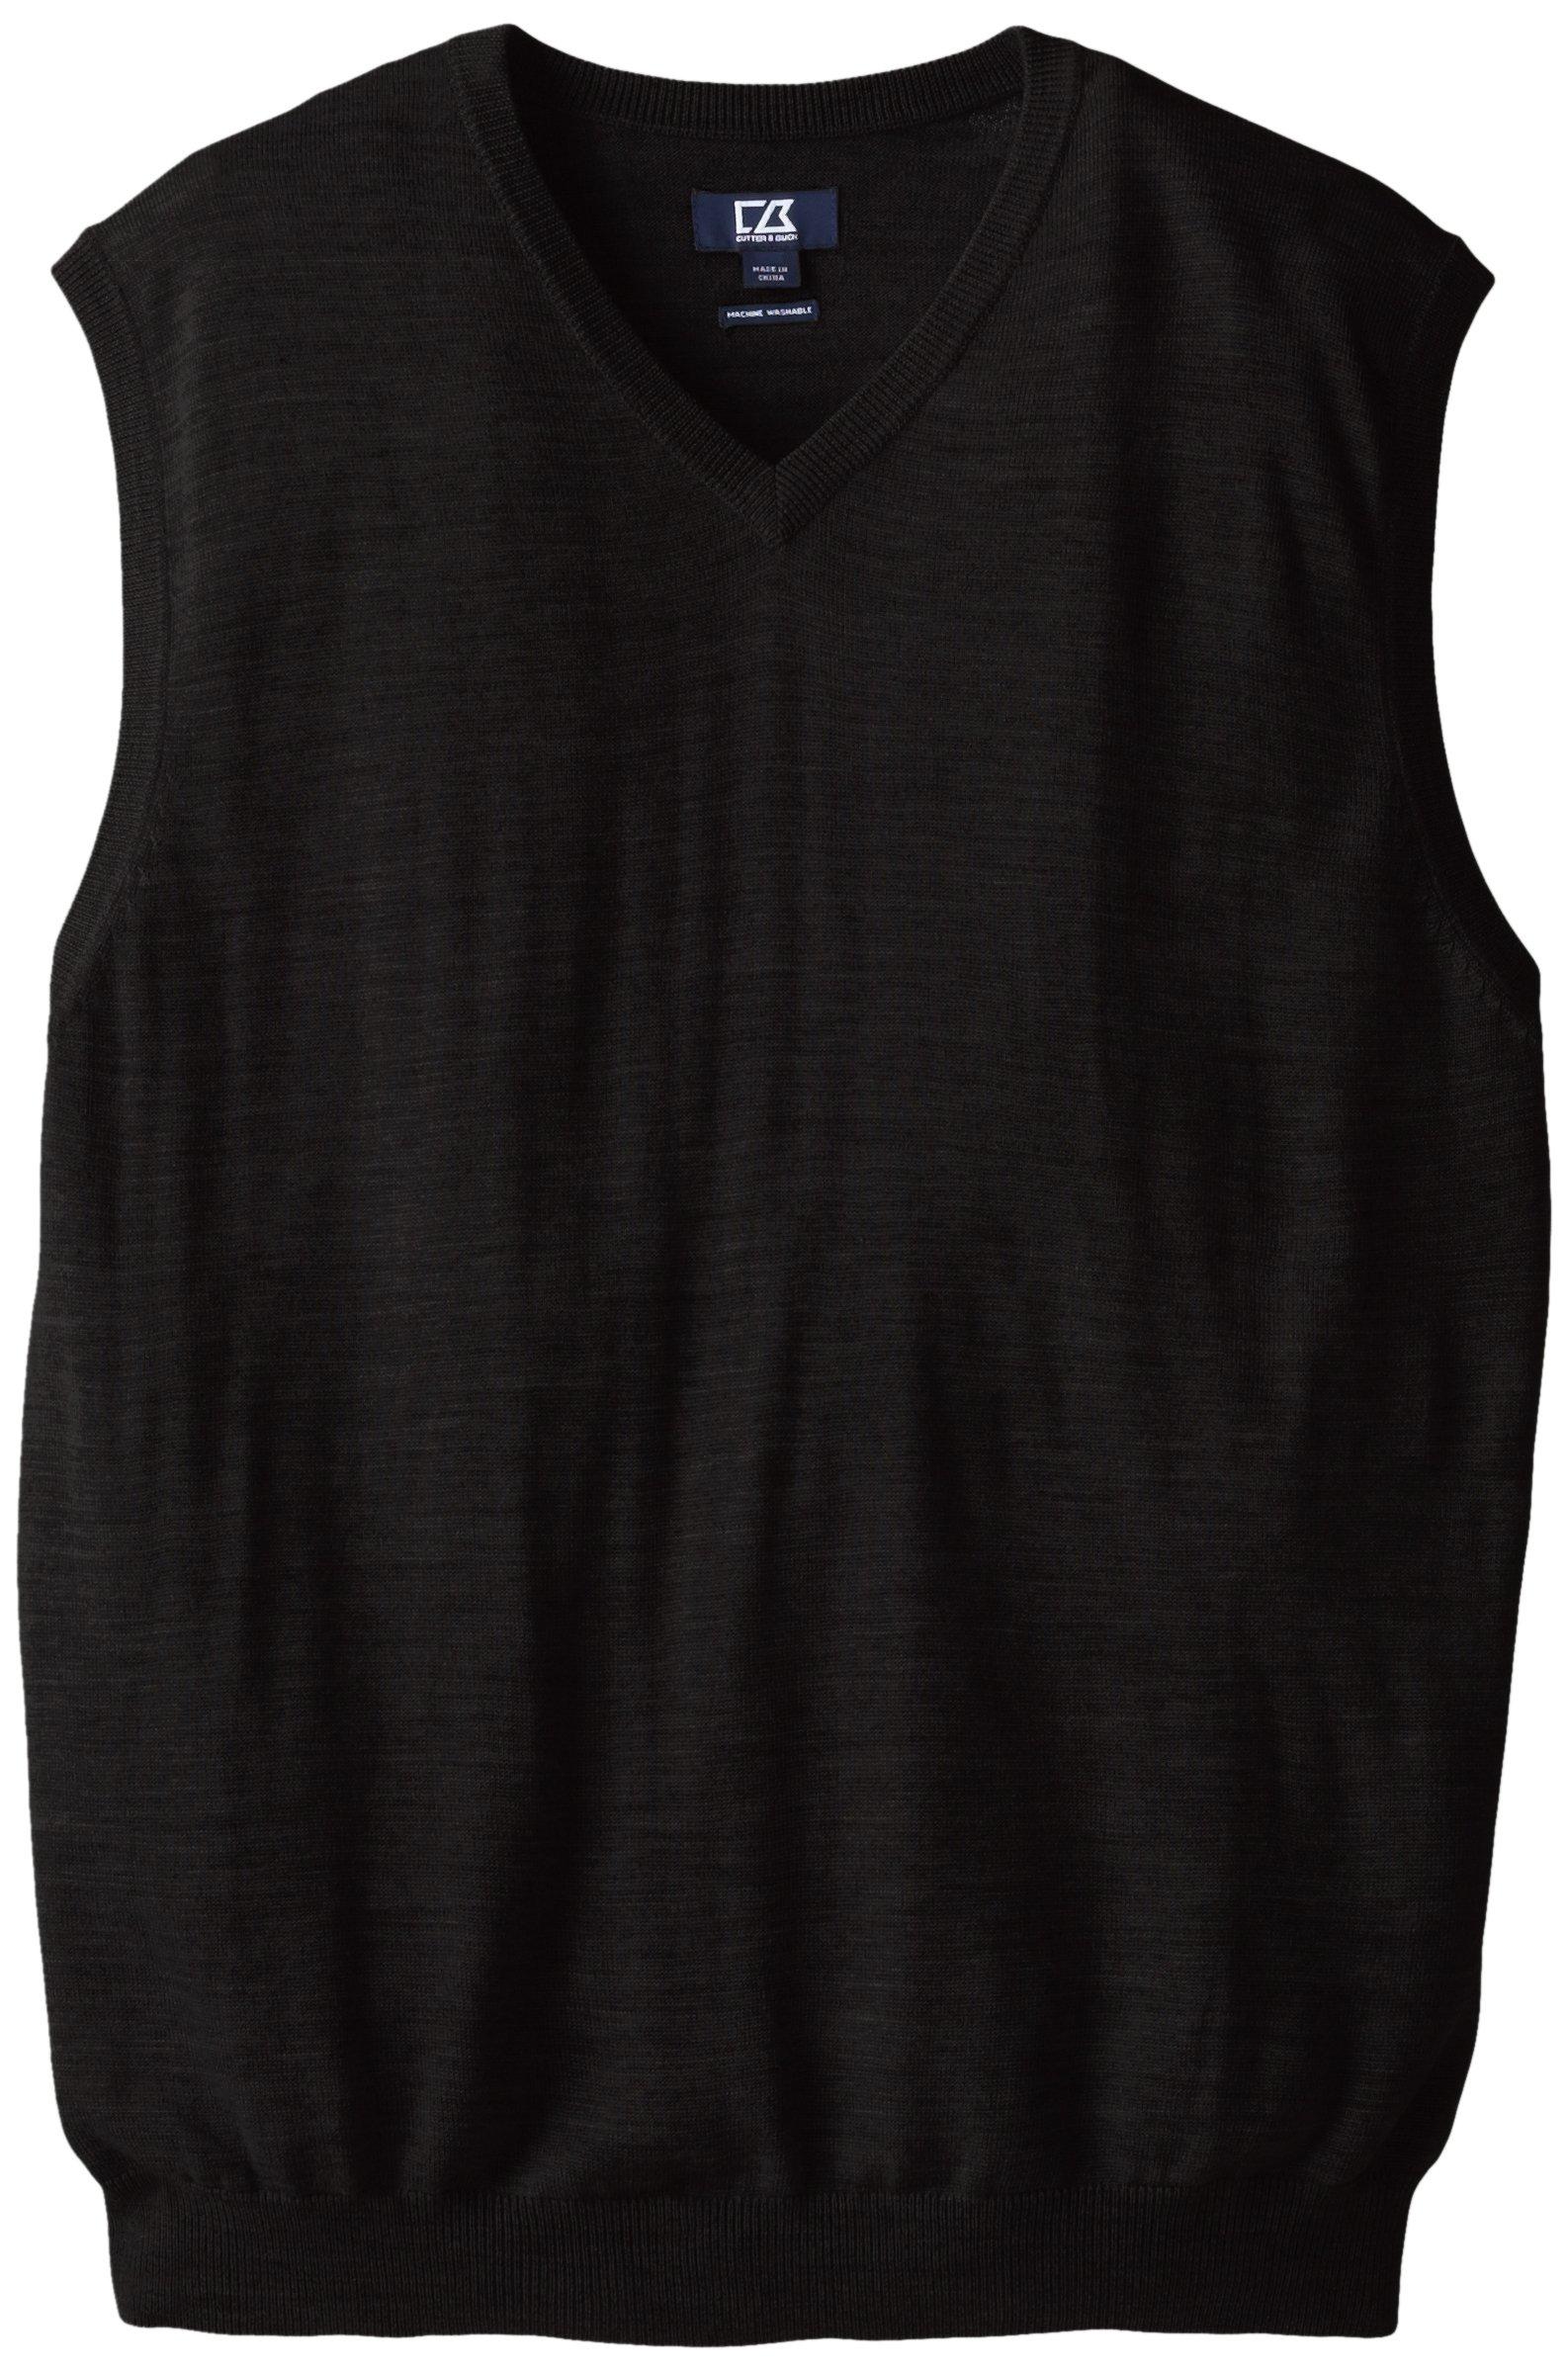 Cutter & Buck Men's Big-Tall Douglas V-Neck Sweater Vest, Black, 3X/Big by Cutter